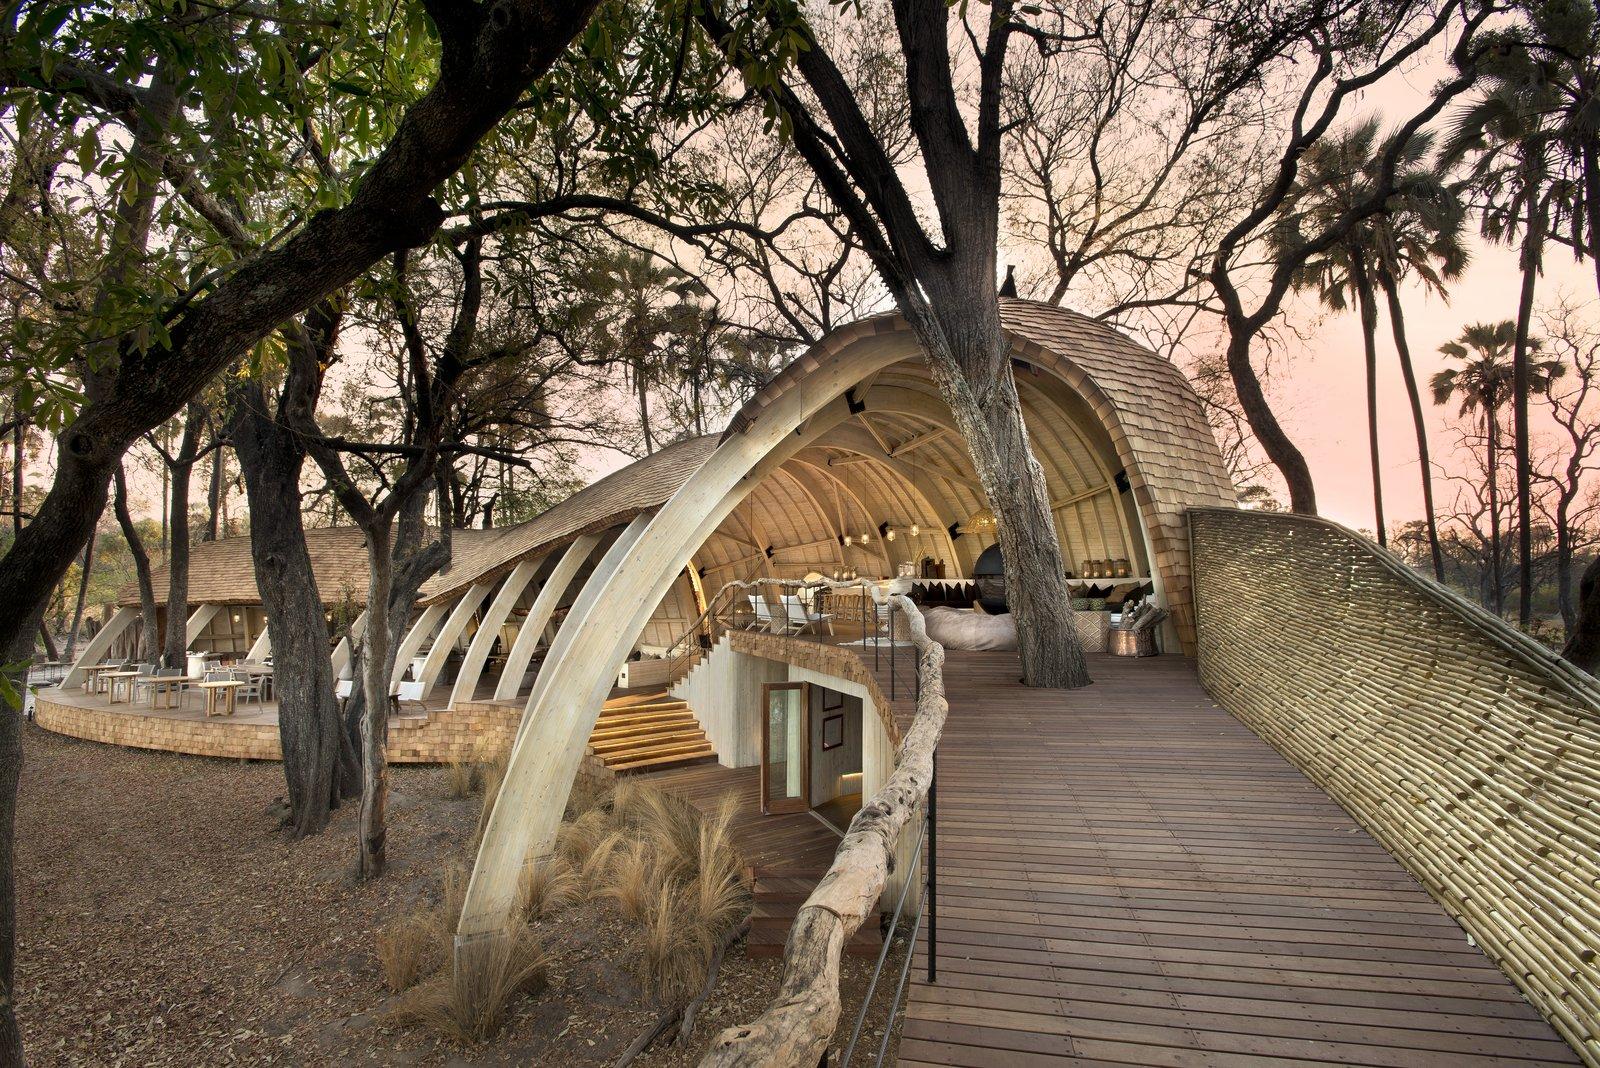 Photo 3 of 13 in Eco-Friendly Safari Lodge in Africa's Okavango Delta